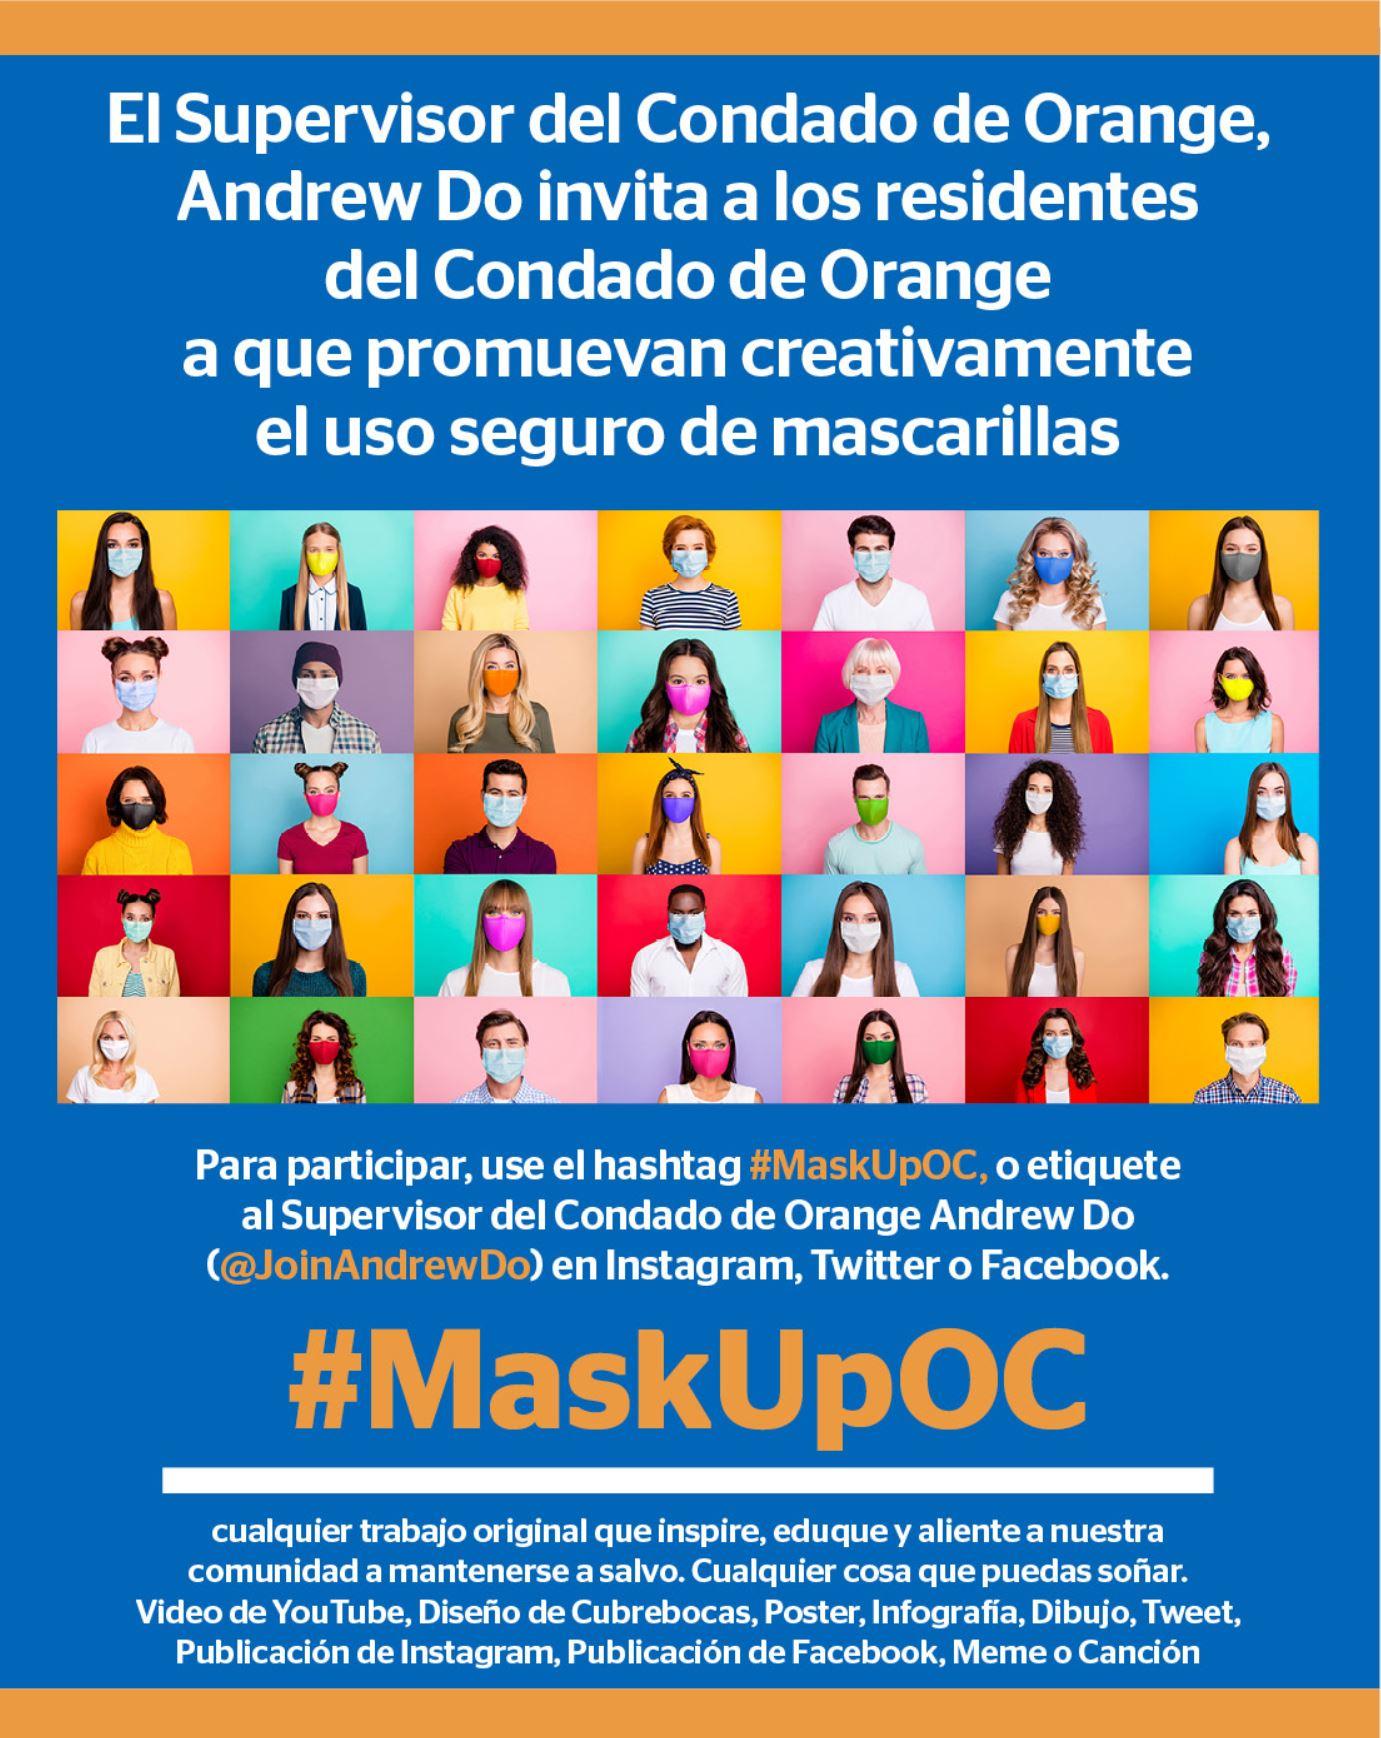 #MaskUpOC